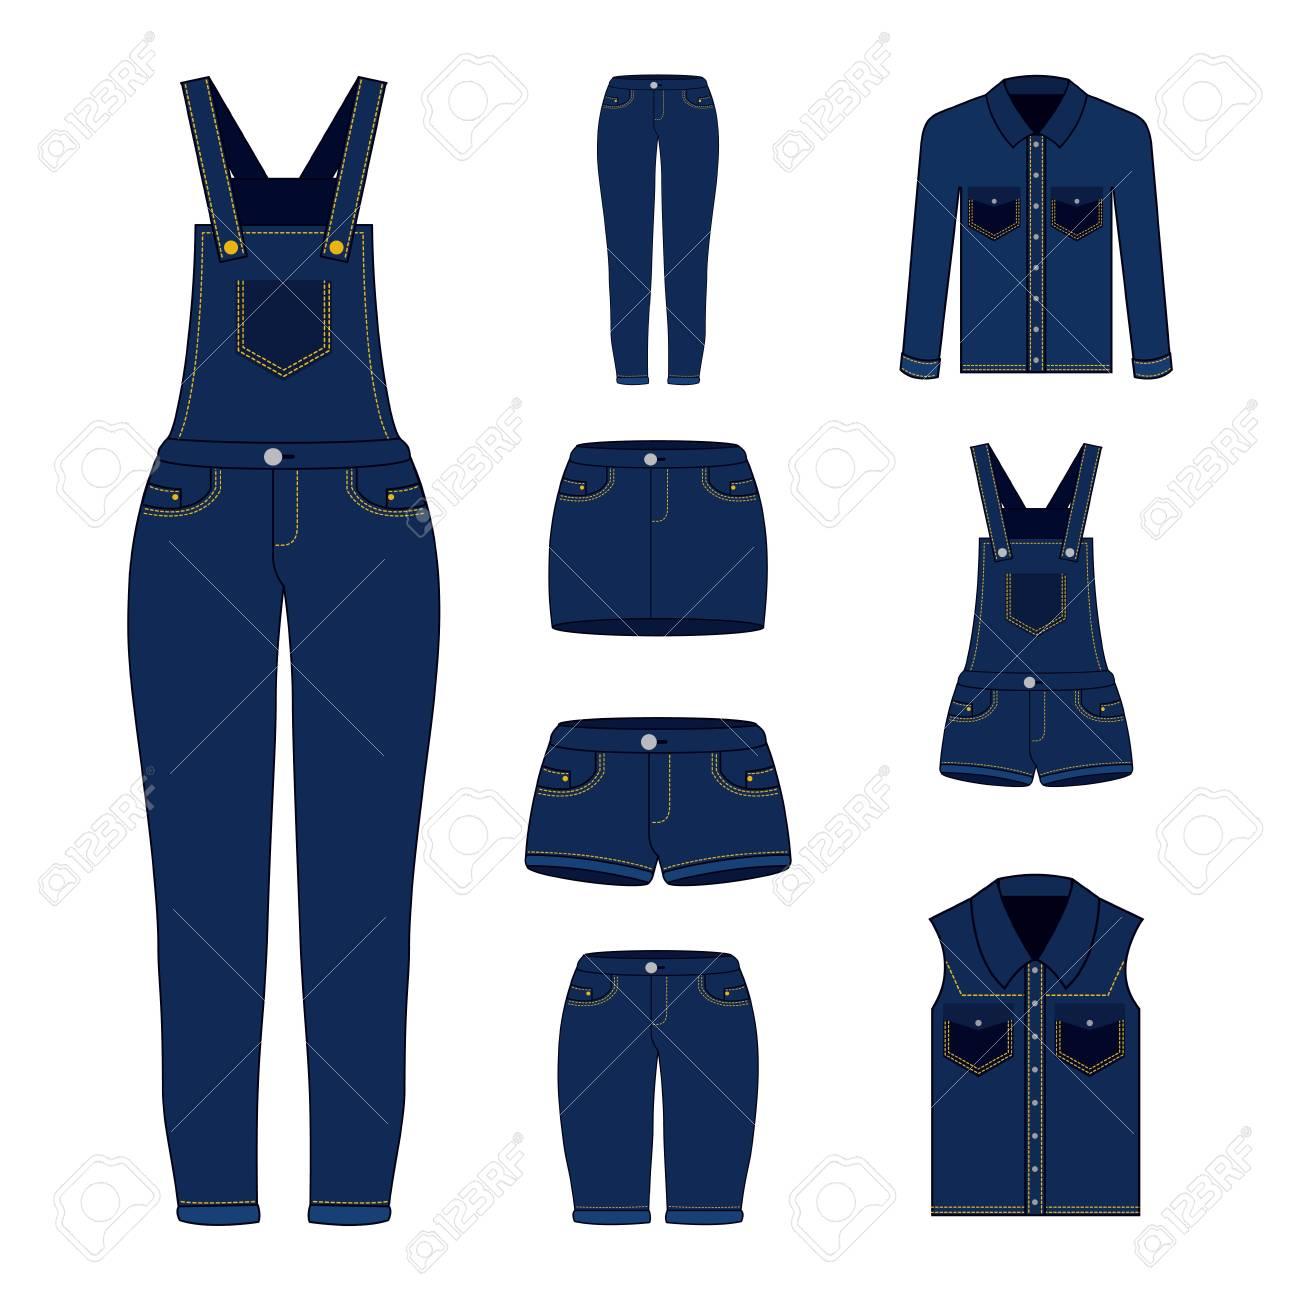 add30b1adcd4 denim women clothes set blue jean shorts overalls skirt jacket and vest  vector illustration Stock Vector